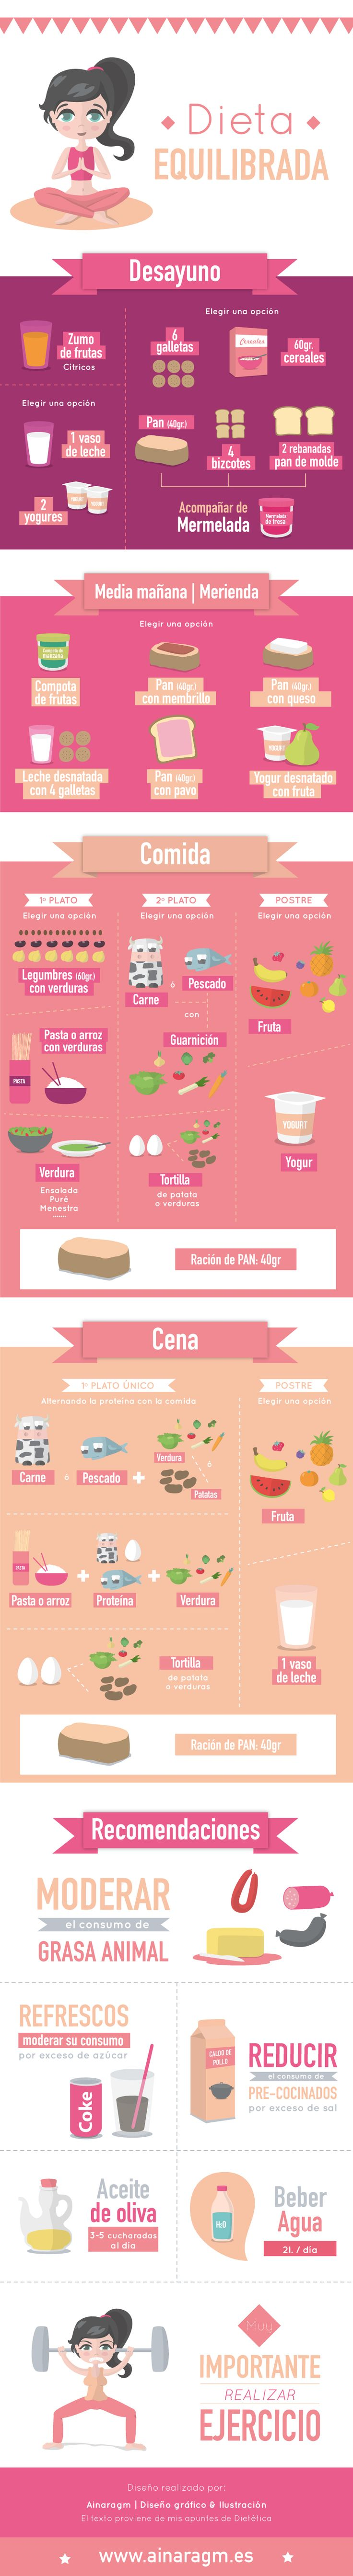 Infografía de una dieta equilibrada #alimentacion #dietetica #salud #infografia #diseno #ilustracion